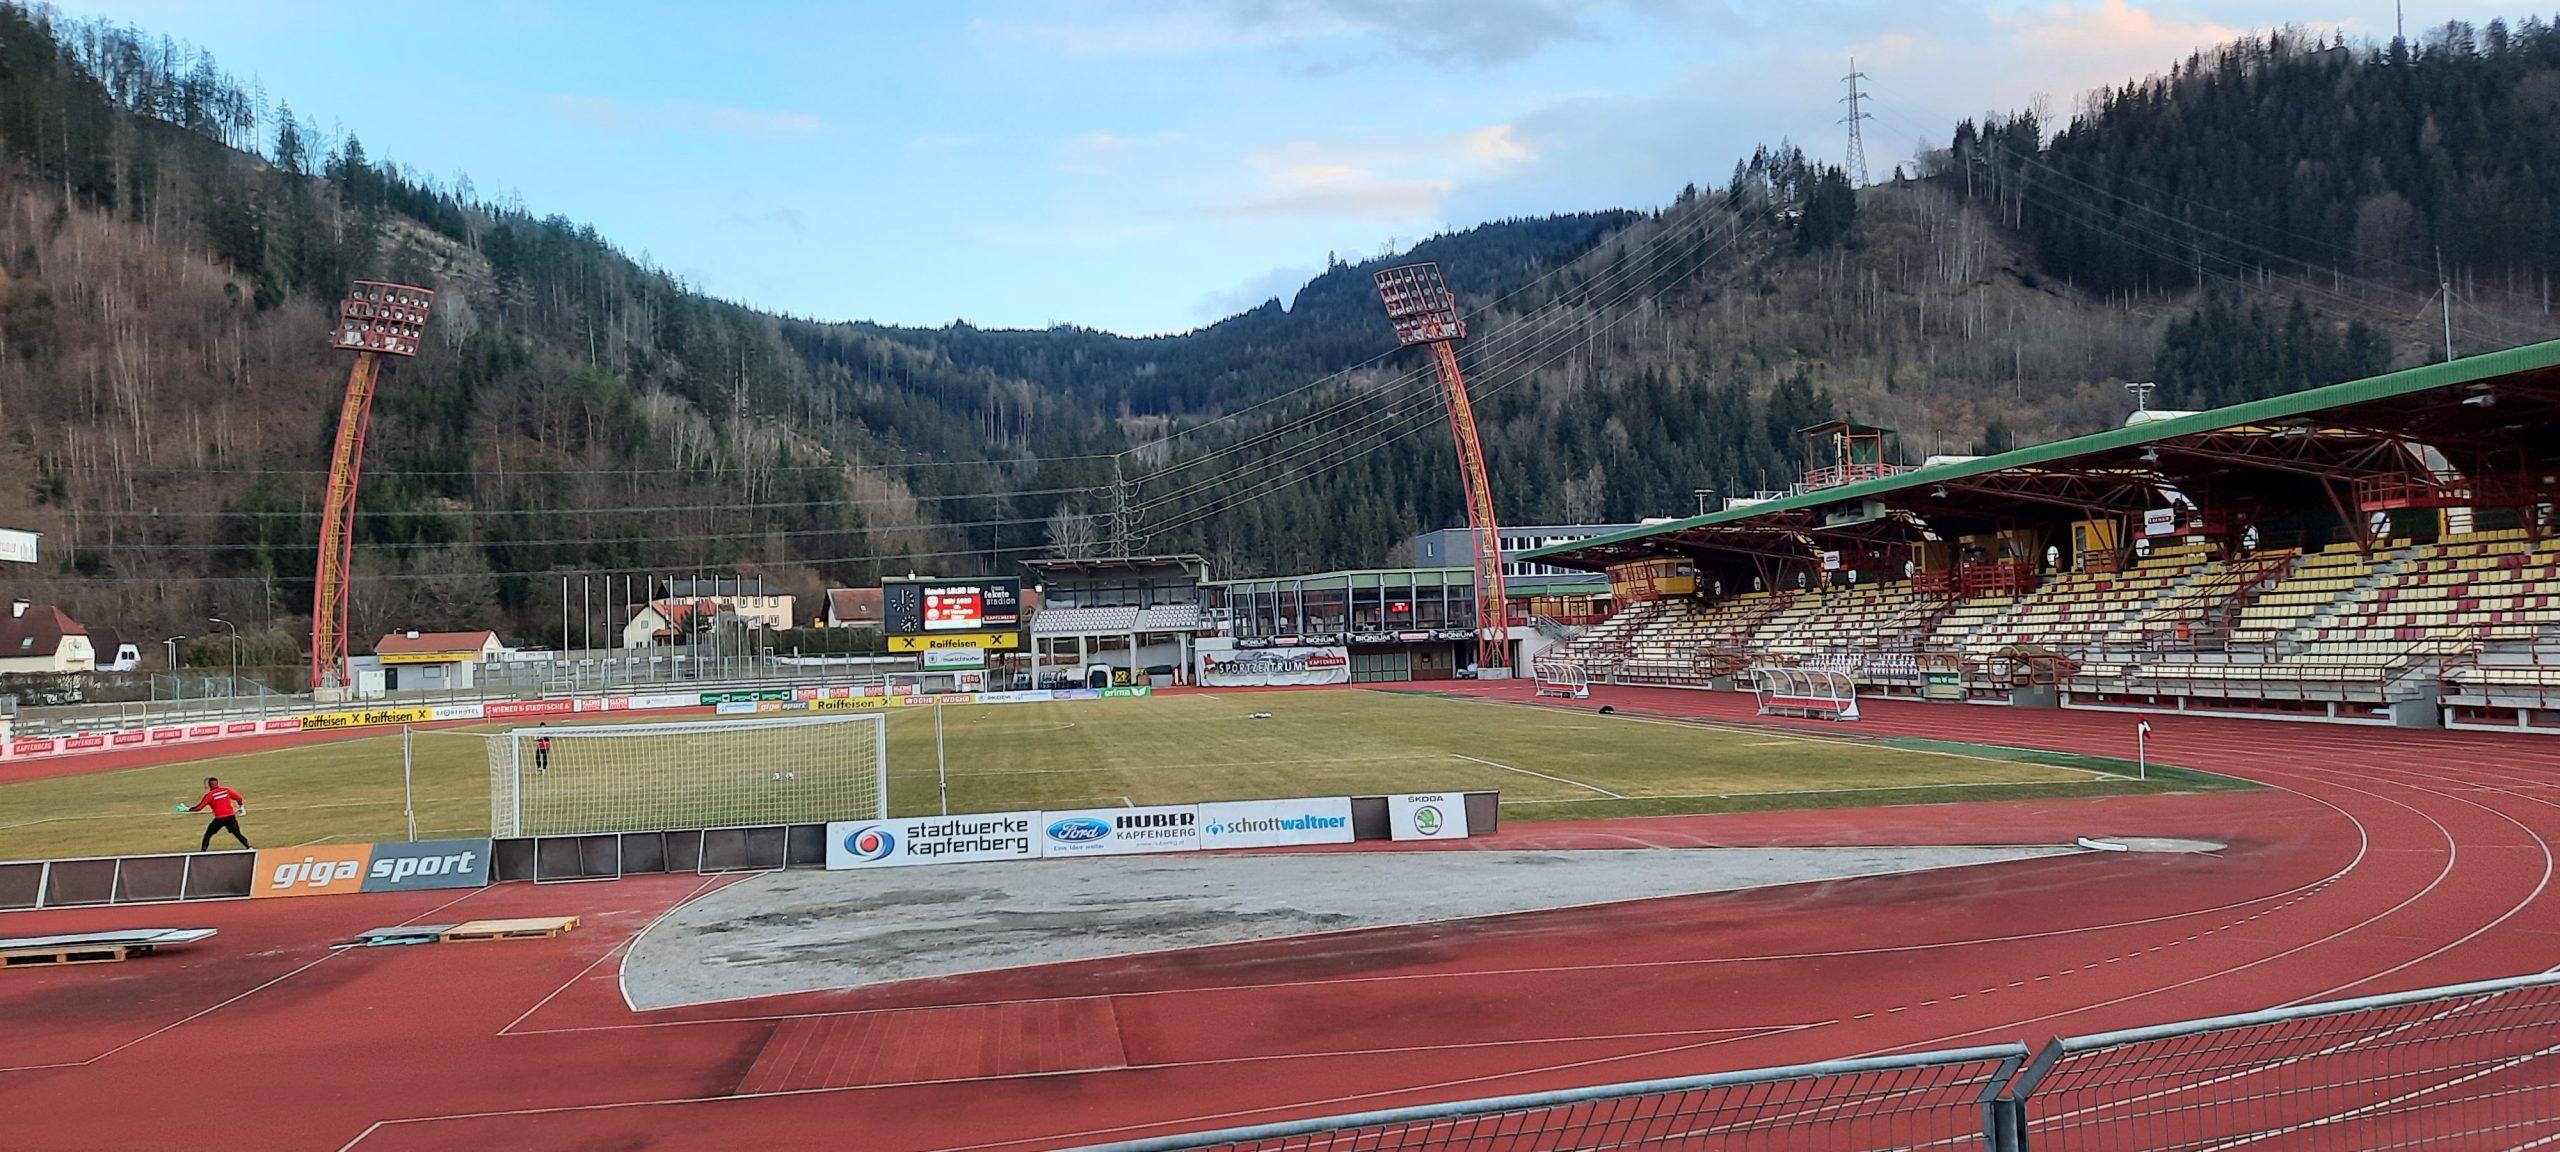 kapfenberg; franz fekete stadion